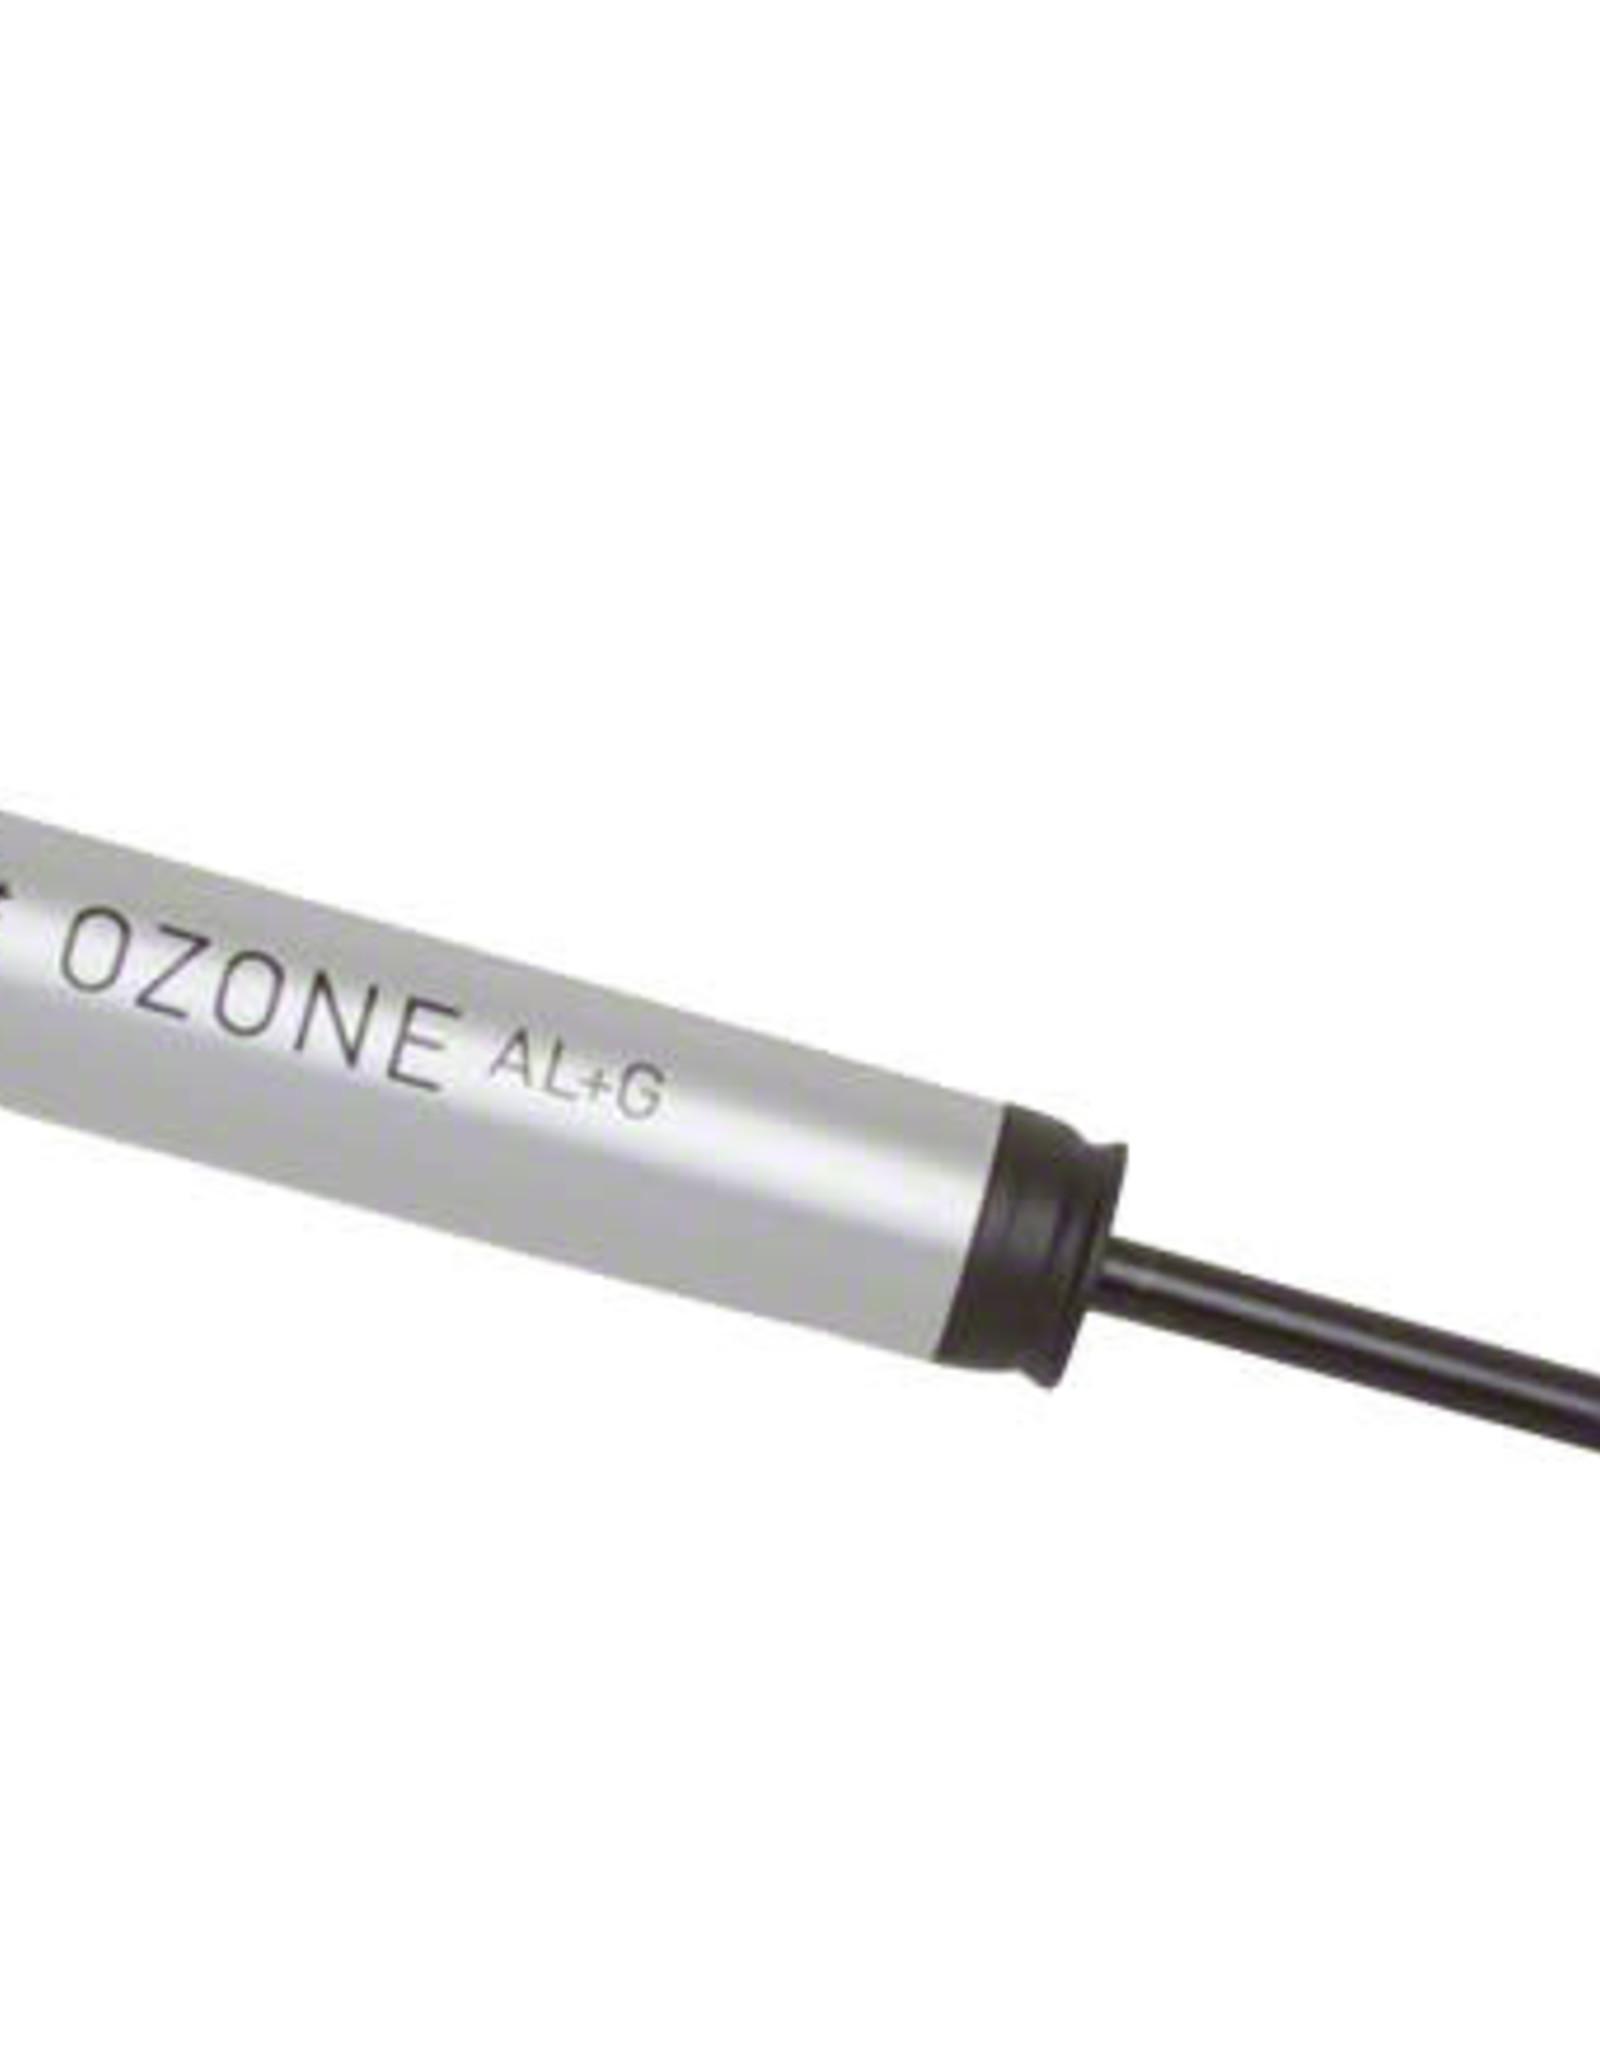 Planet Bike Ozone ATB Aluminum Frame Pump with Gauge: Presta/Schrader, Silver/Black